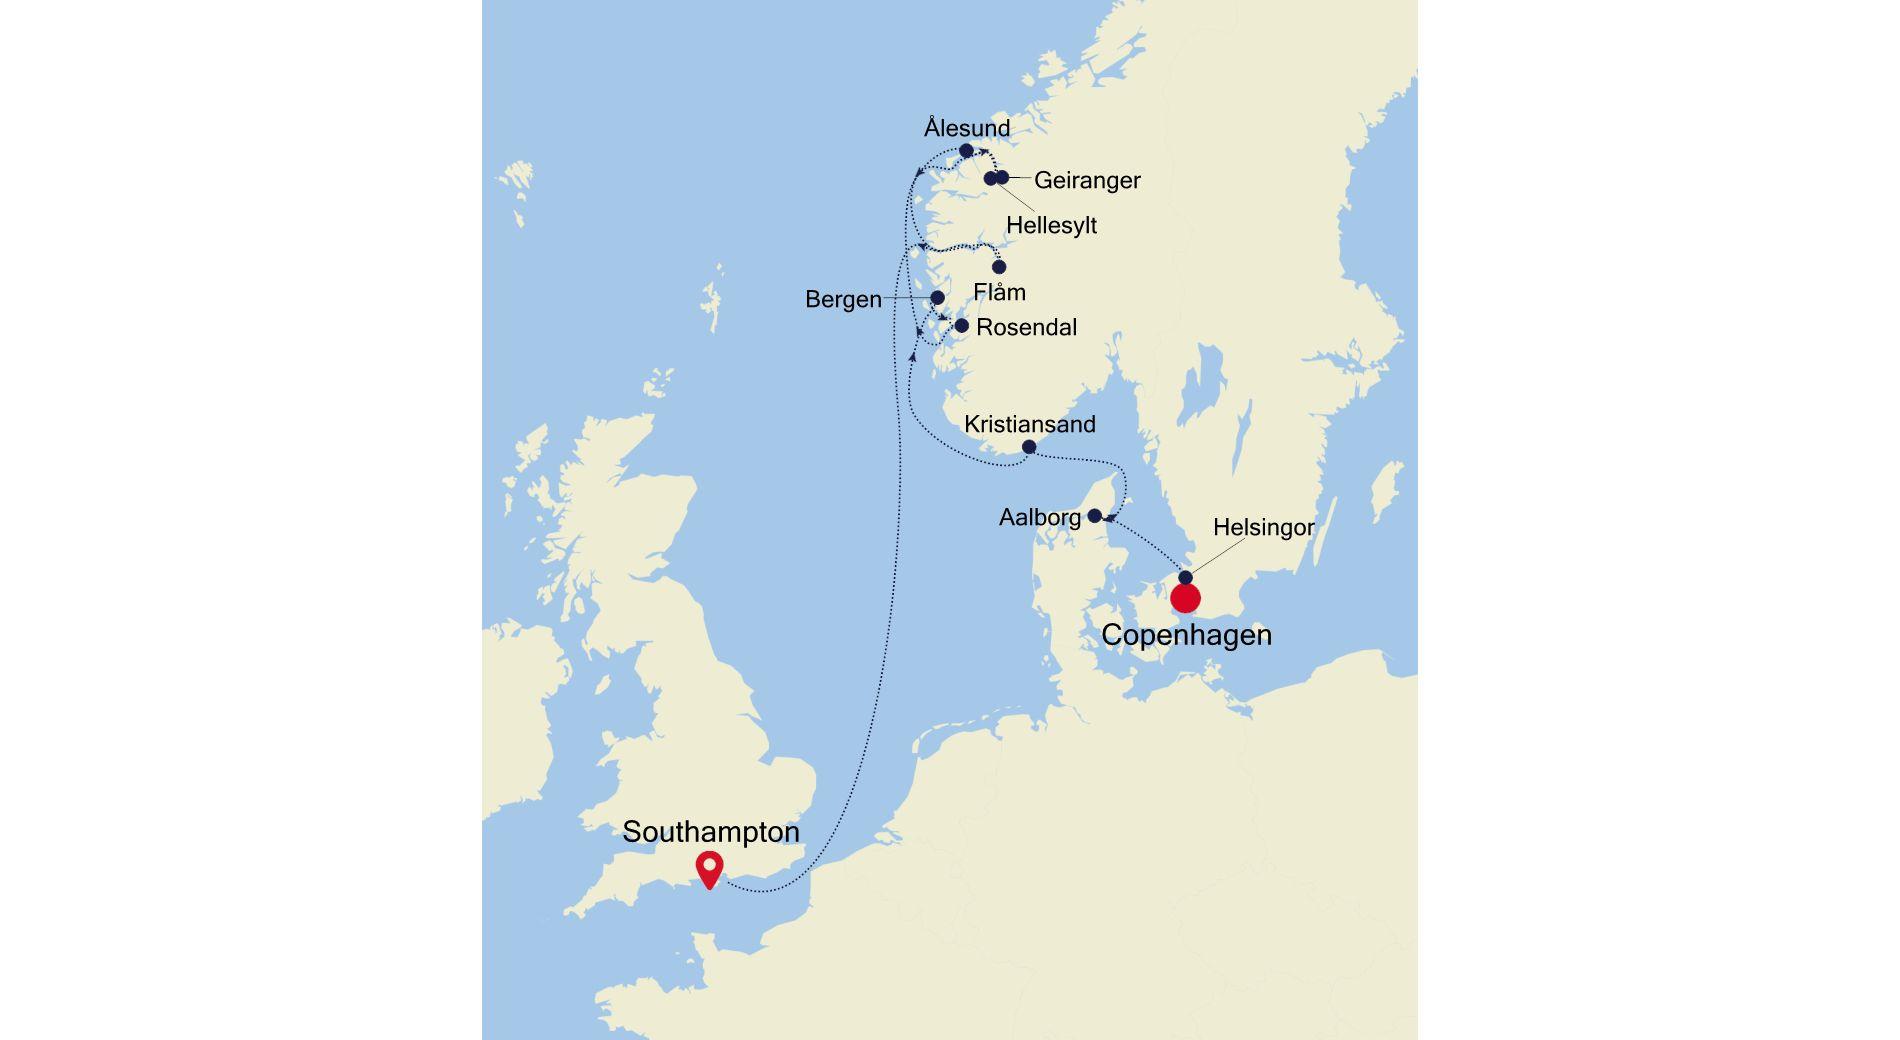 SL210823011 - Copenhagen nach Southampton